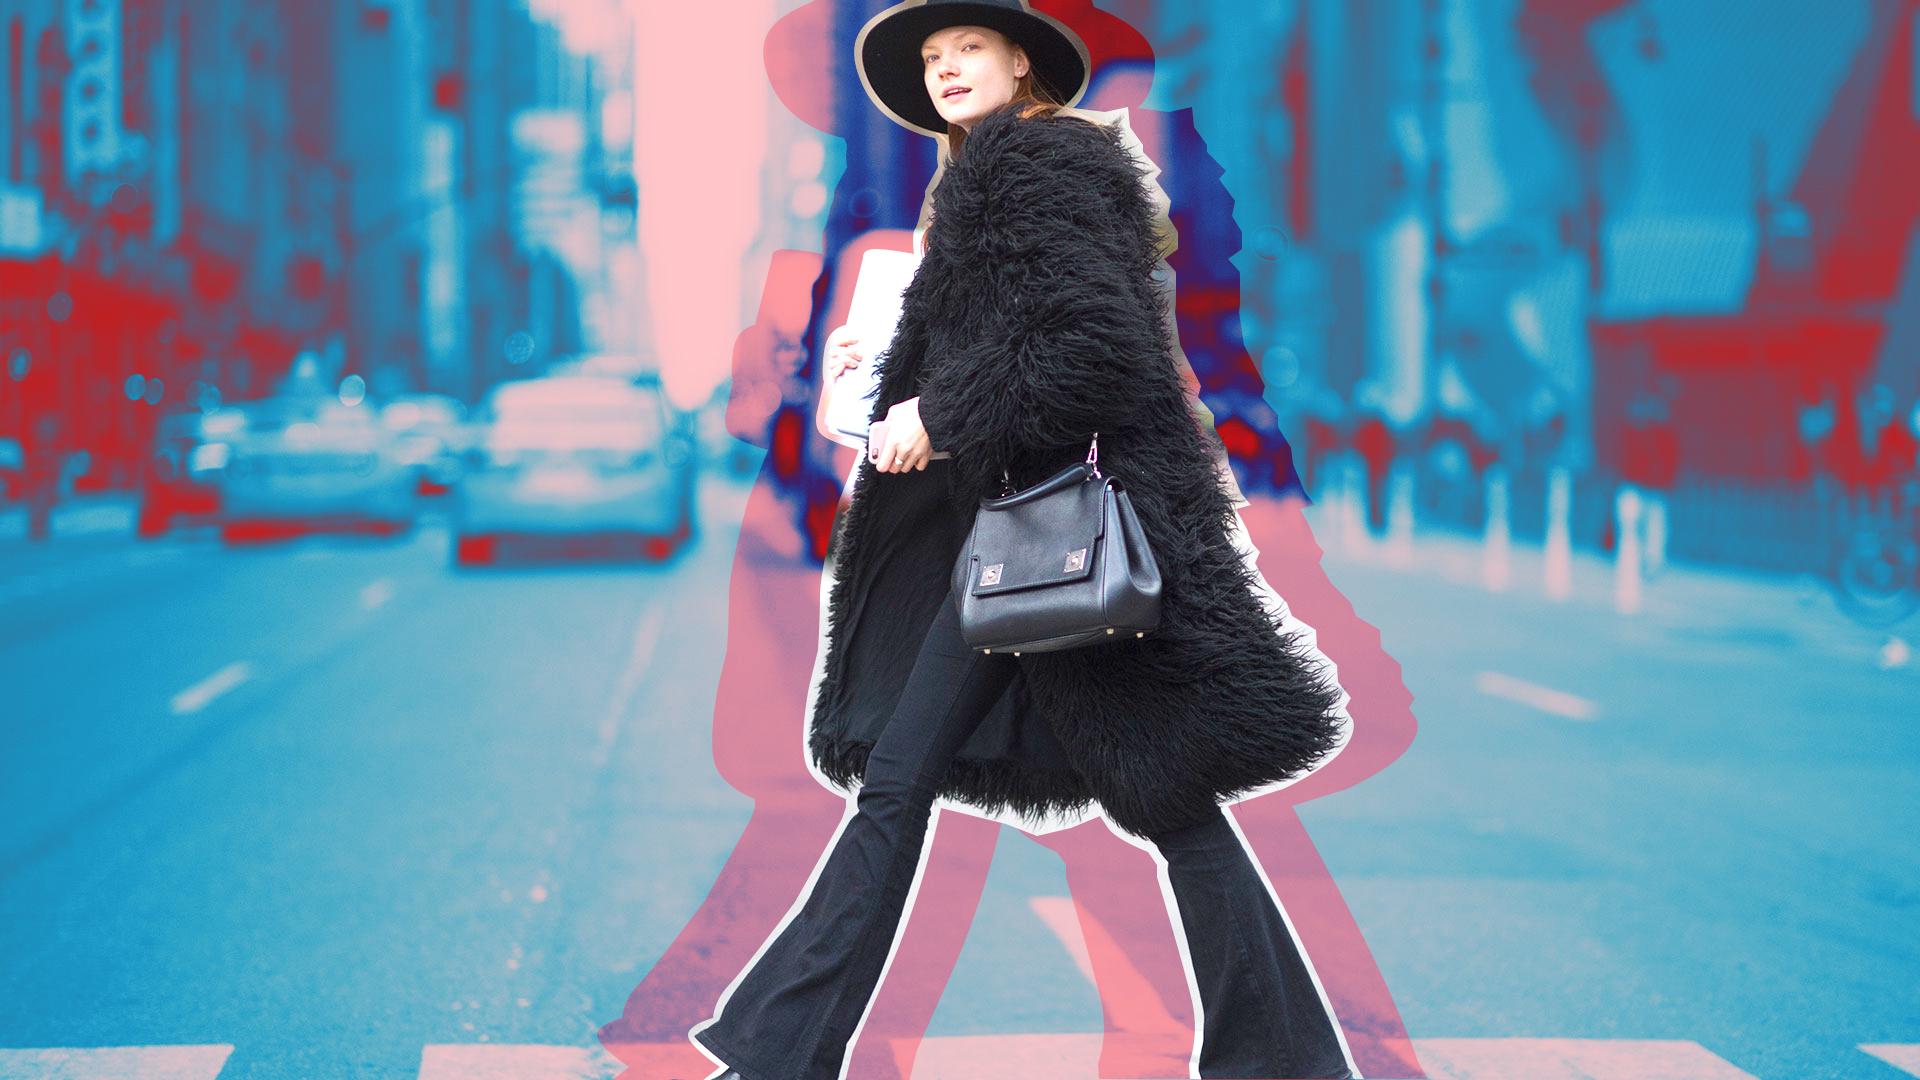 Stylish Woman Crossing Street